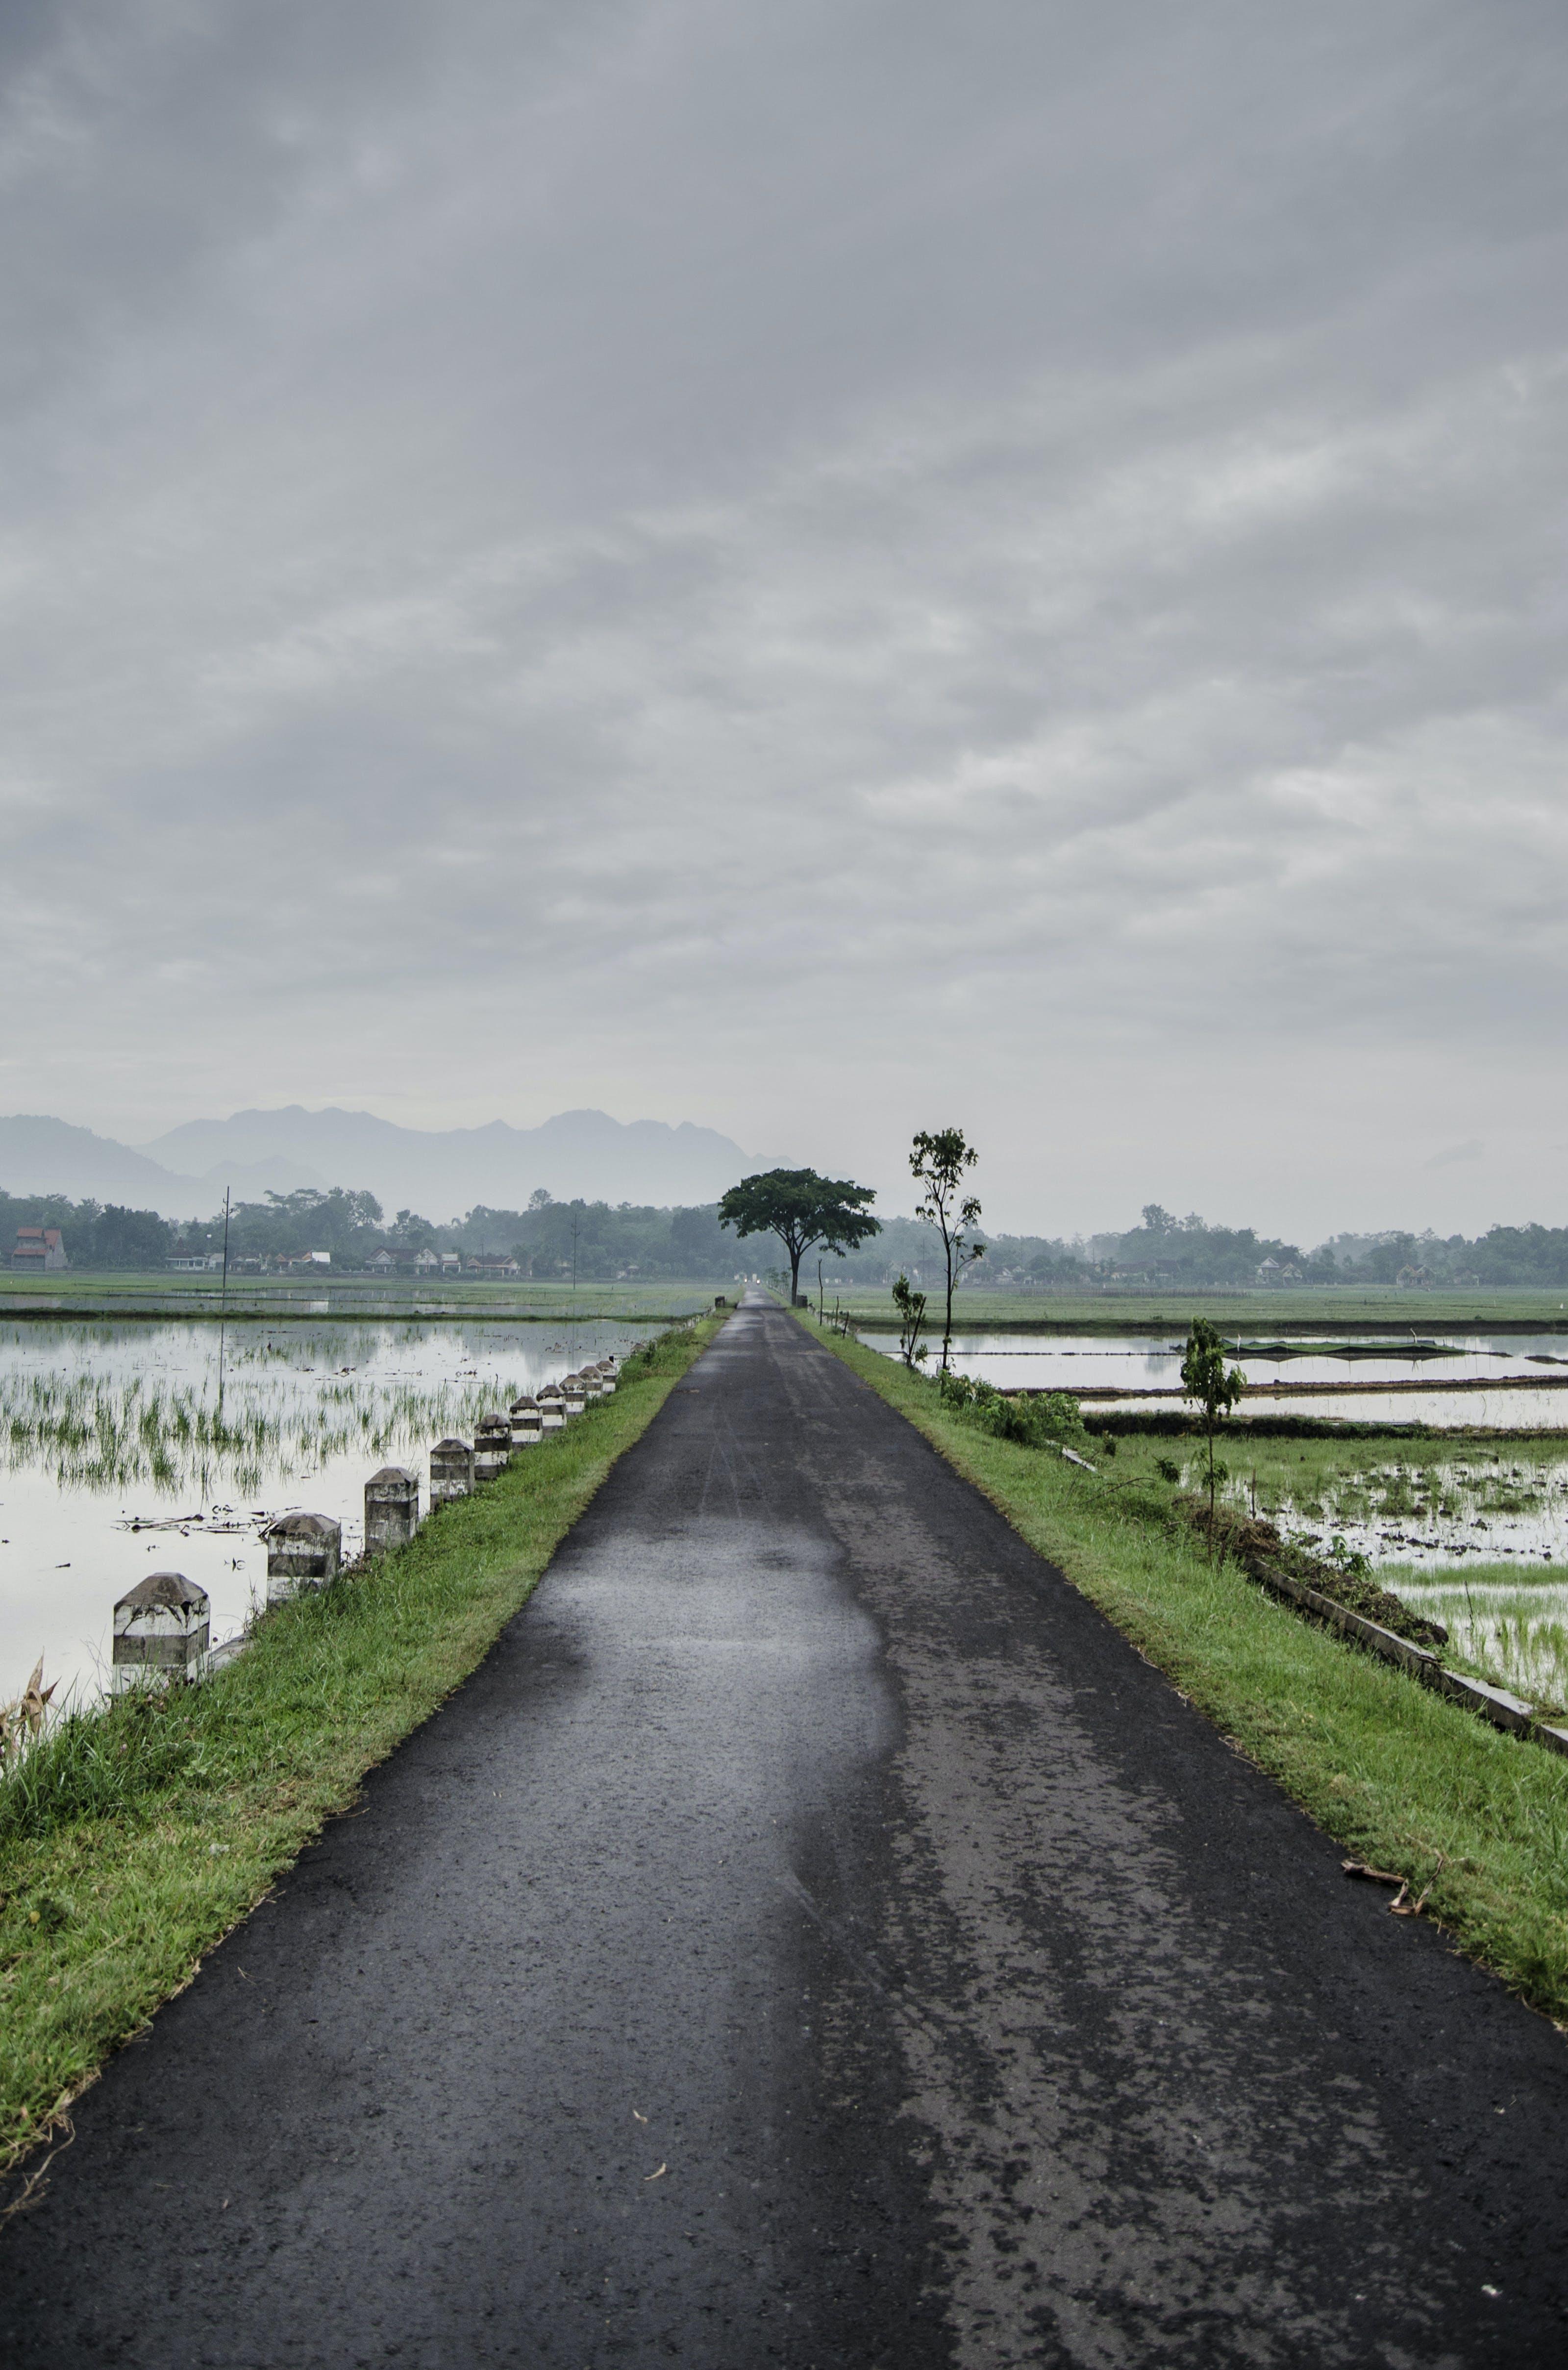 Free stock photo of road, rainy, wet, dark clouds